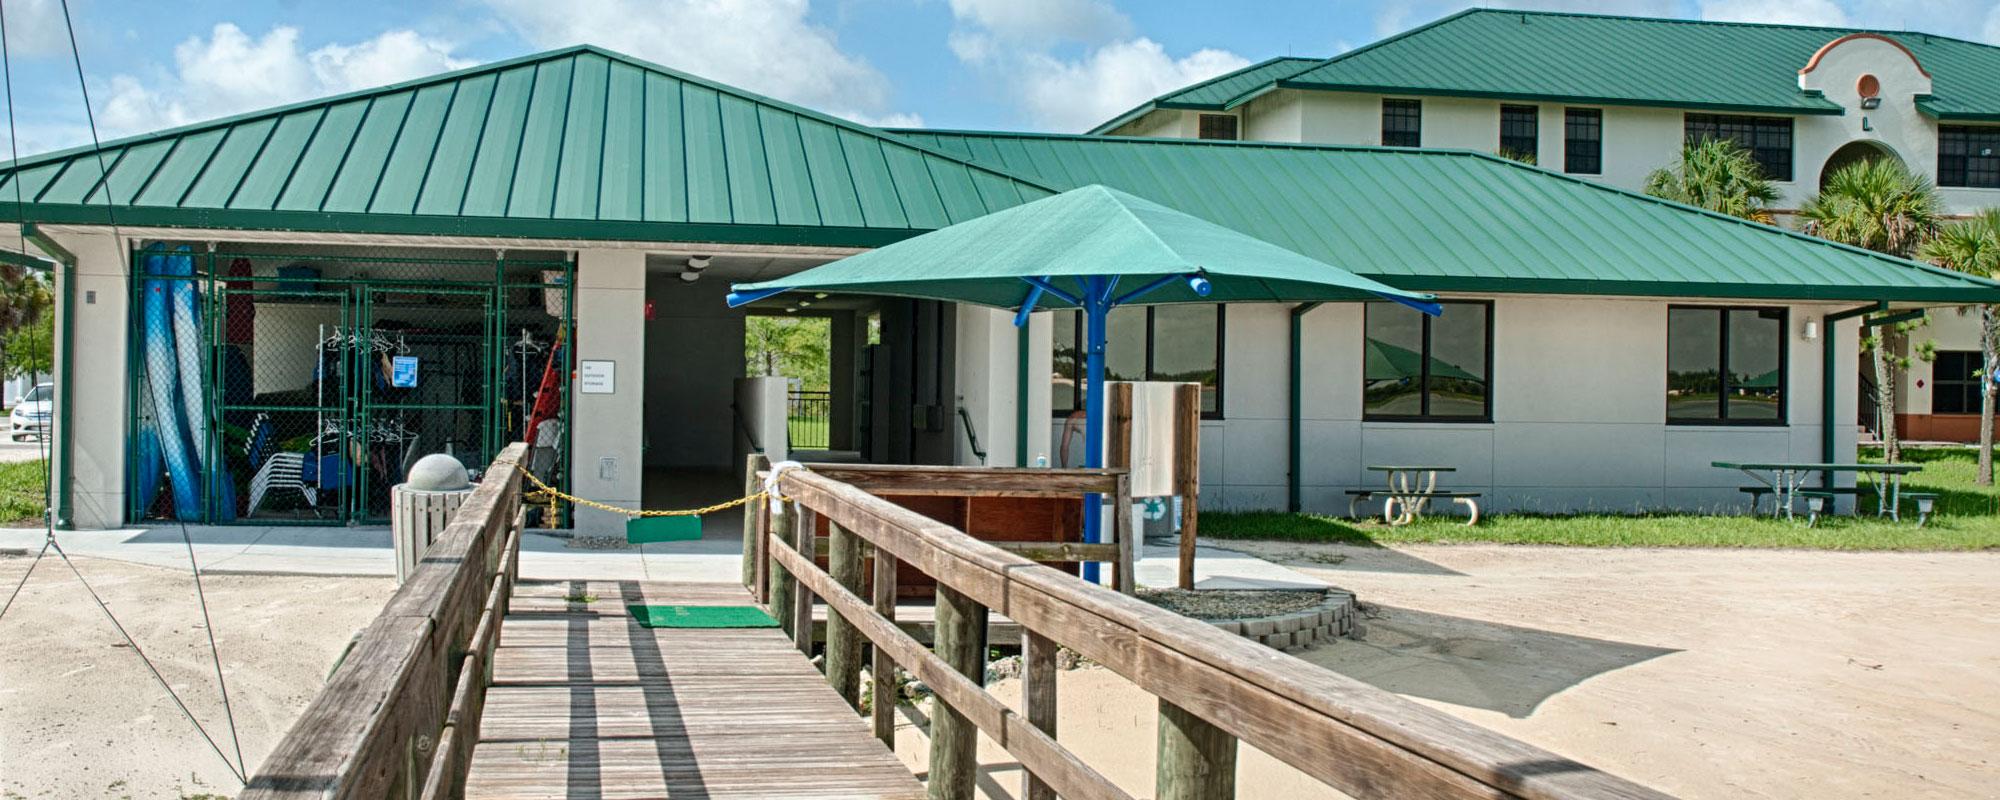 FGCU North Lake Bath House – Ft. Myers